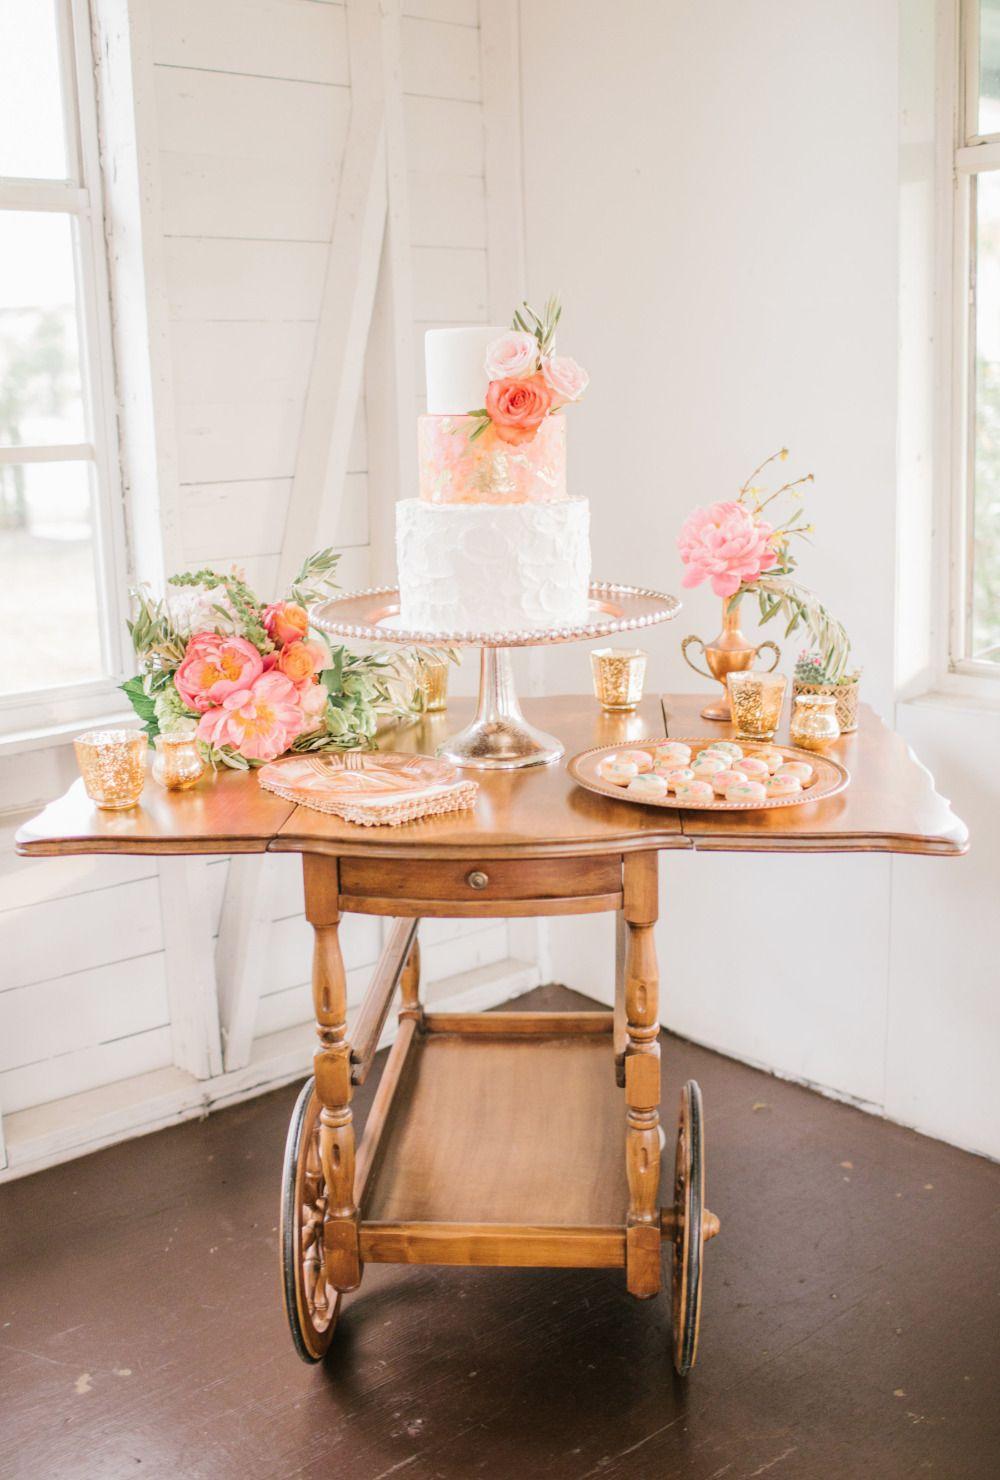 Copper and rose whimsical wedding wedding cake backdrop